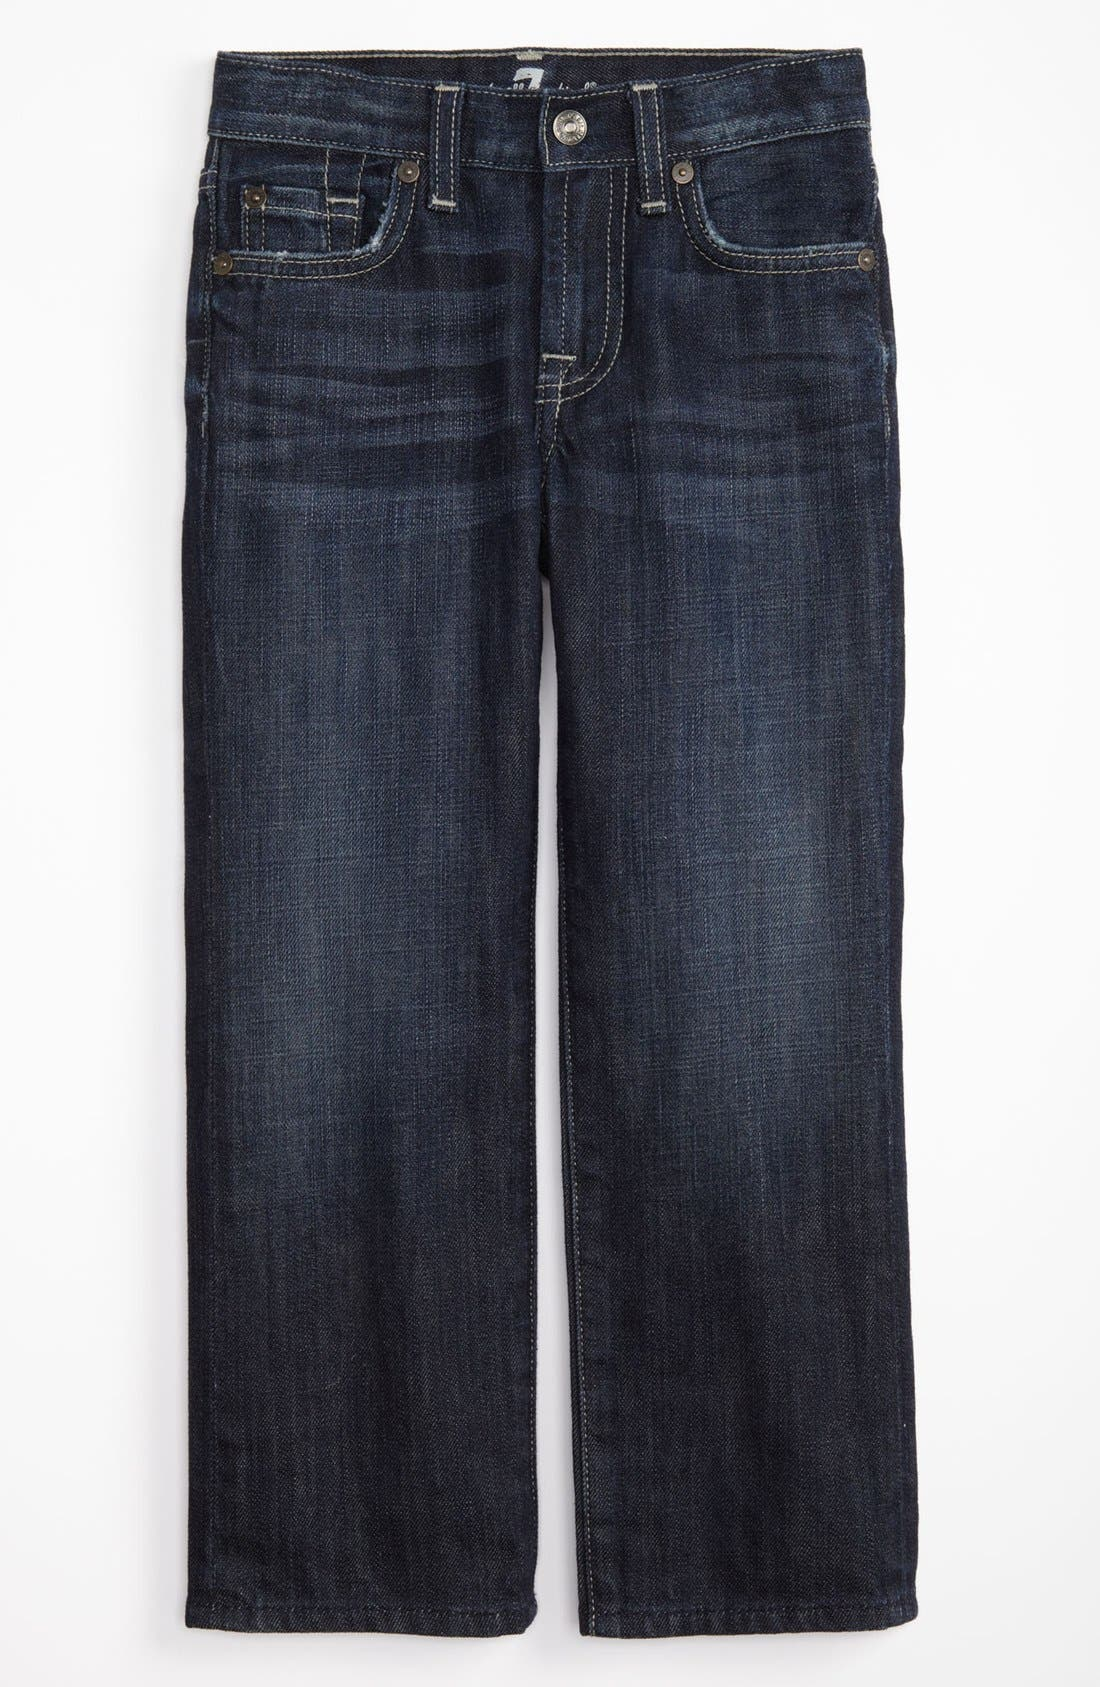 Alternate Image 2  - 7 For All Mankind® 'Standard' Straight Leg Jeans (Little Boys & Big Boys) (Online Only)